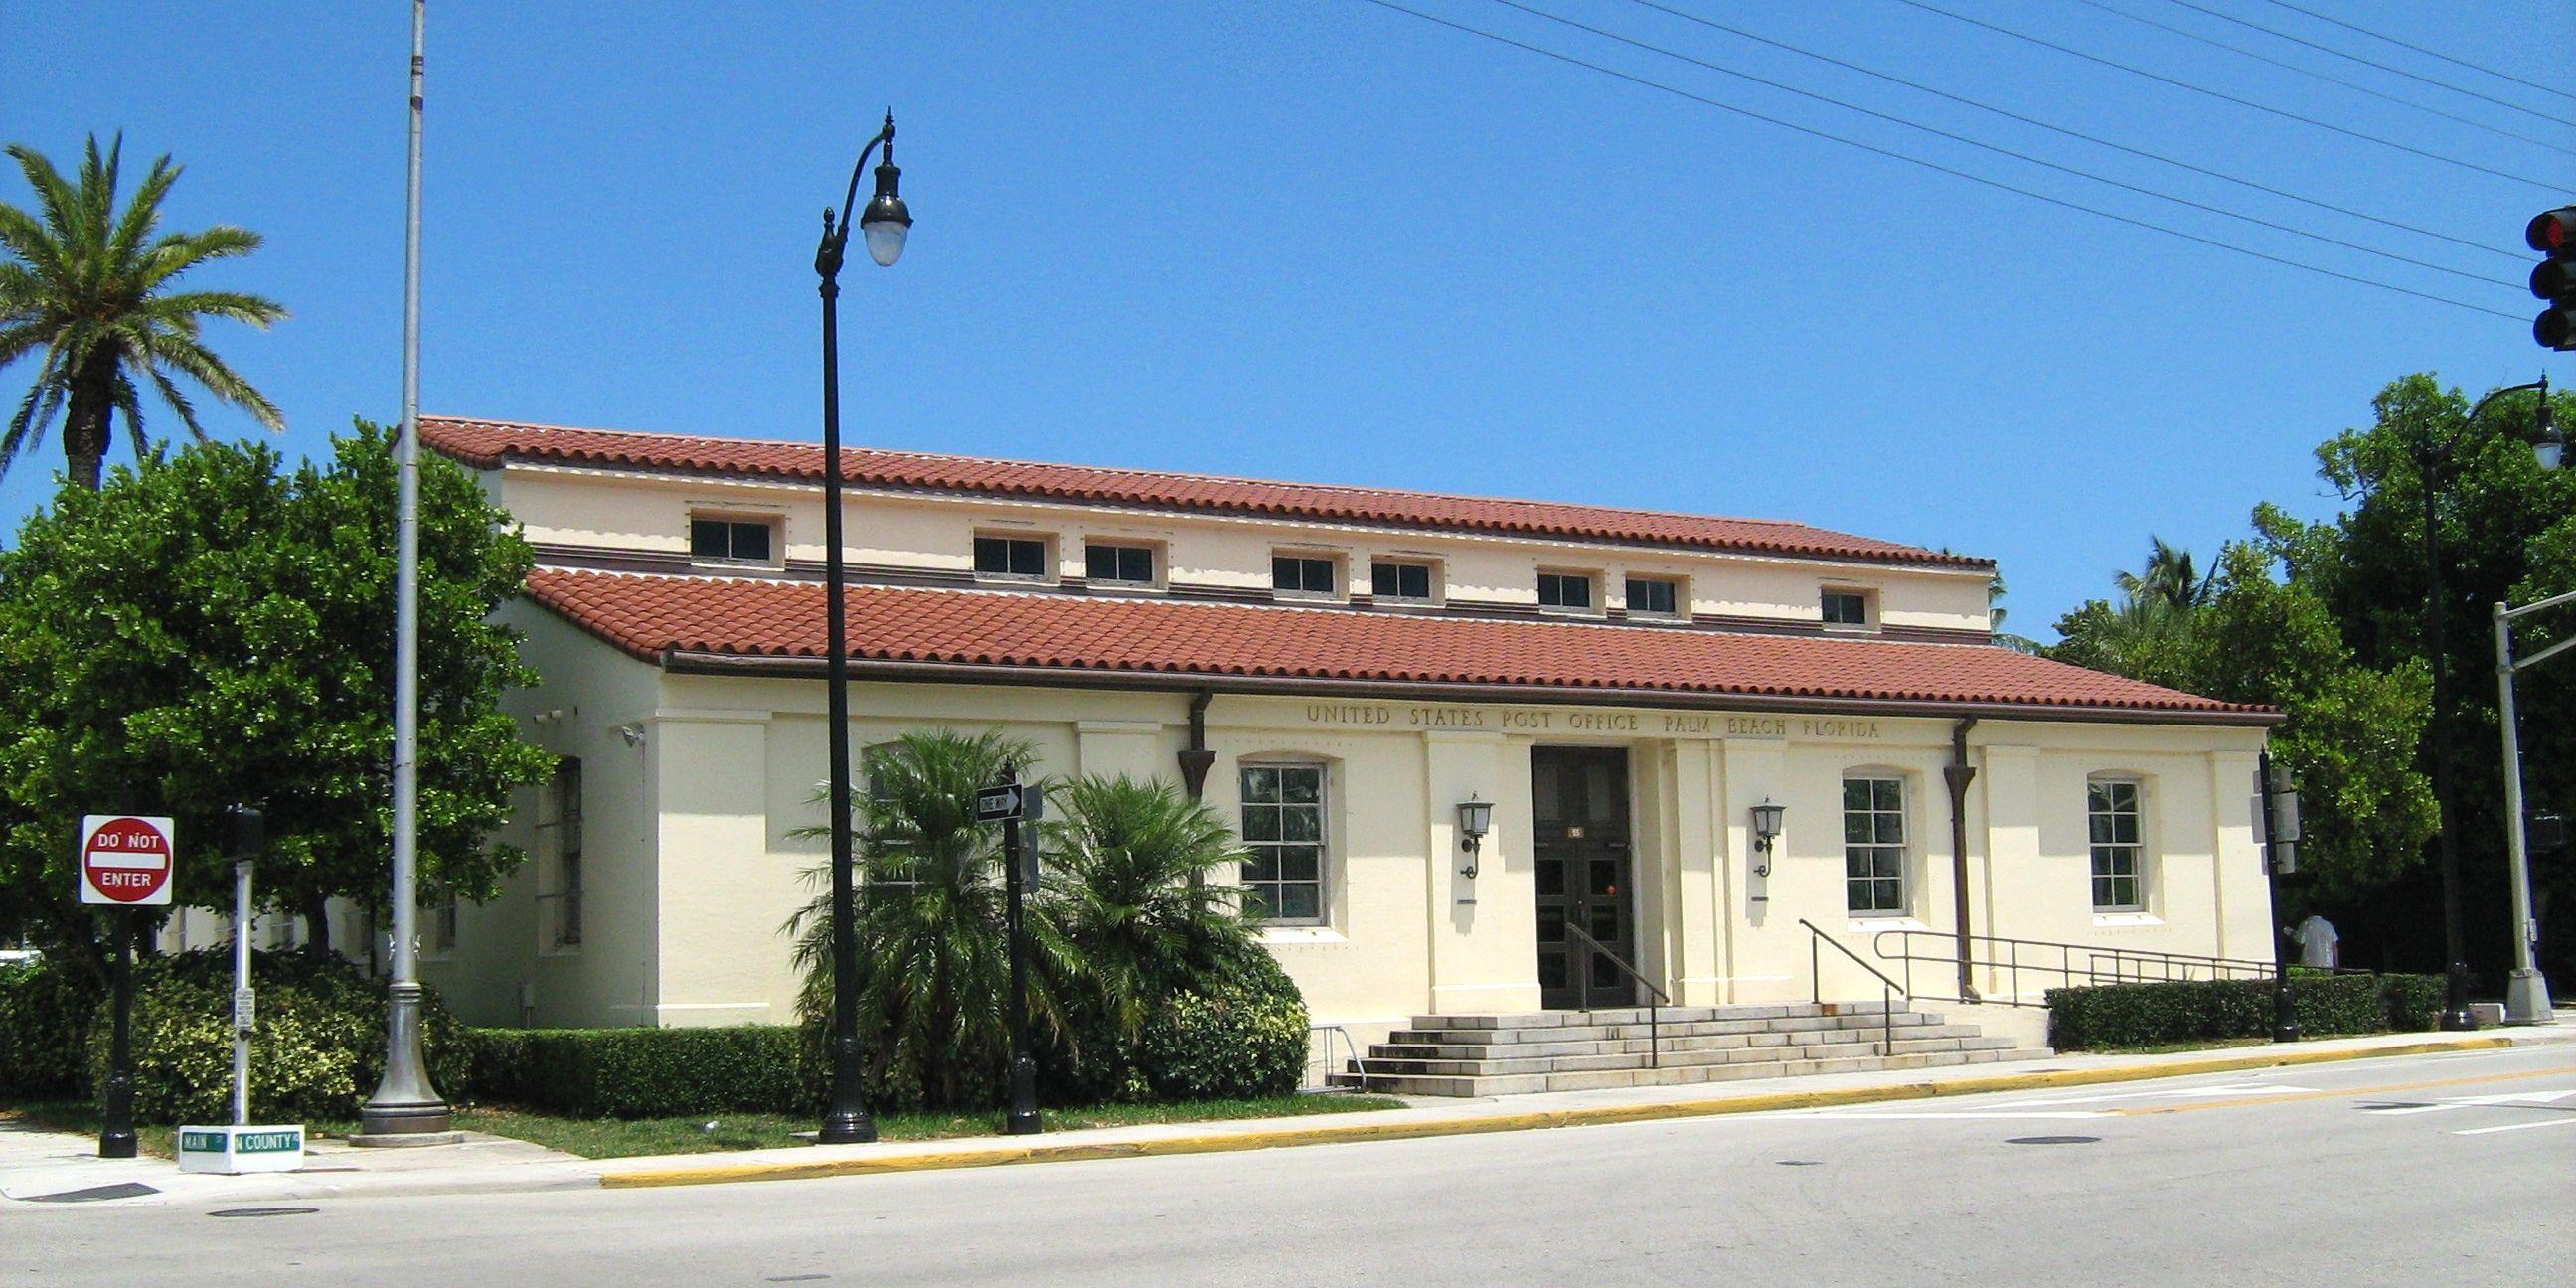 53fe7d11419ecd76143a2e44fba28467 - Homewood Suites By Hilton Palm Beach Gardens Fl